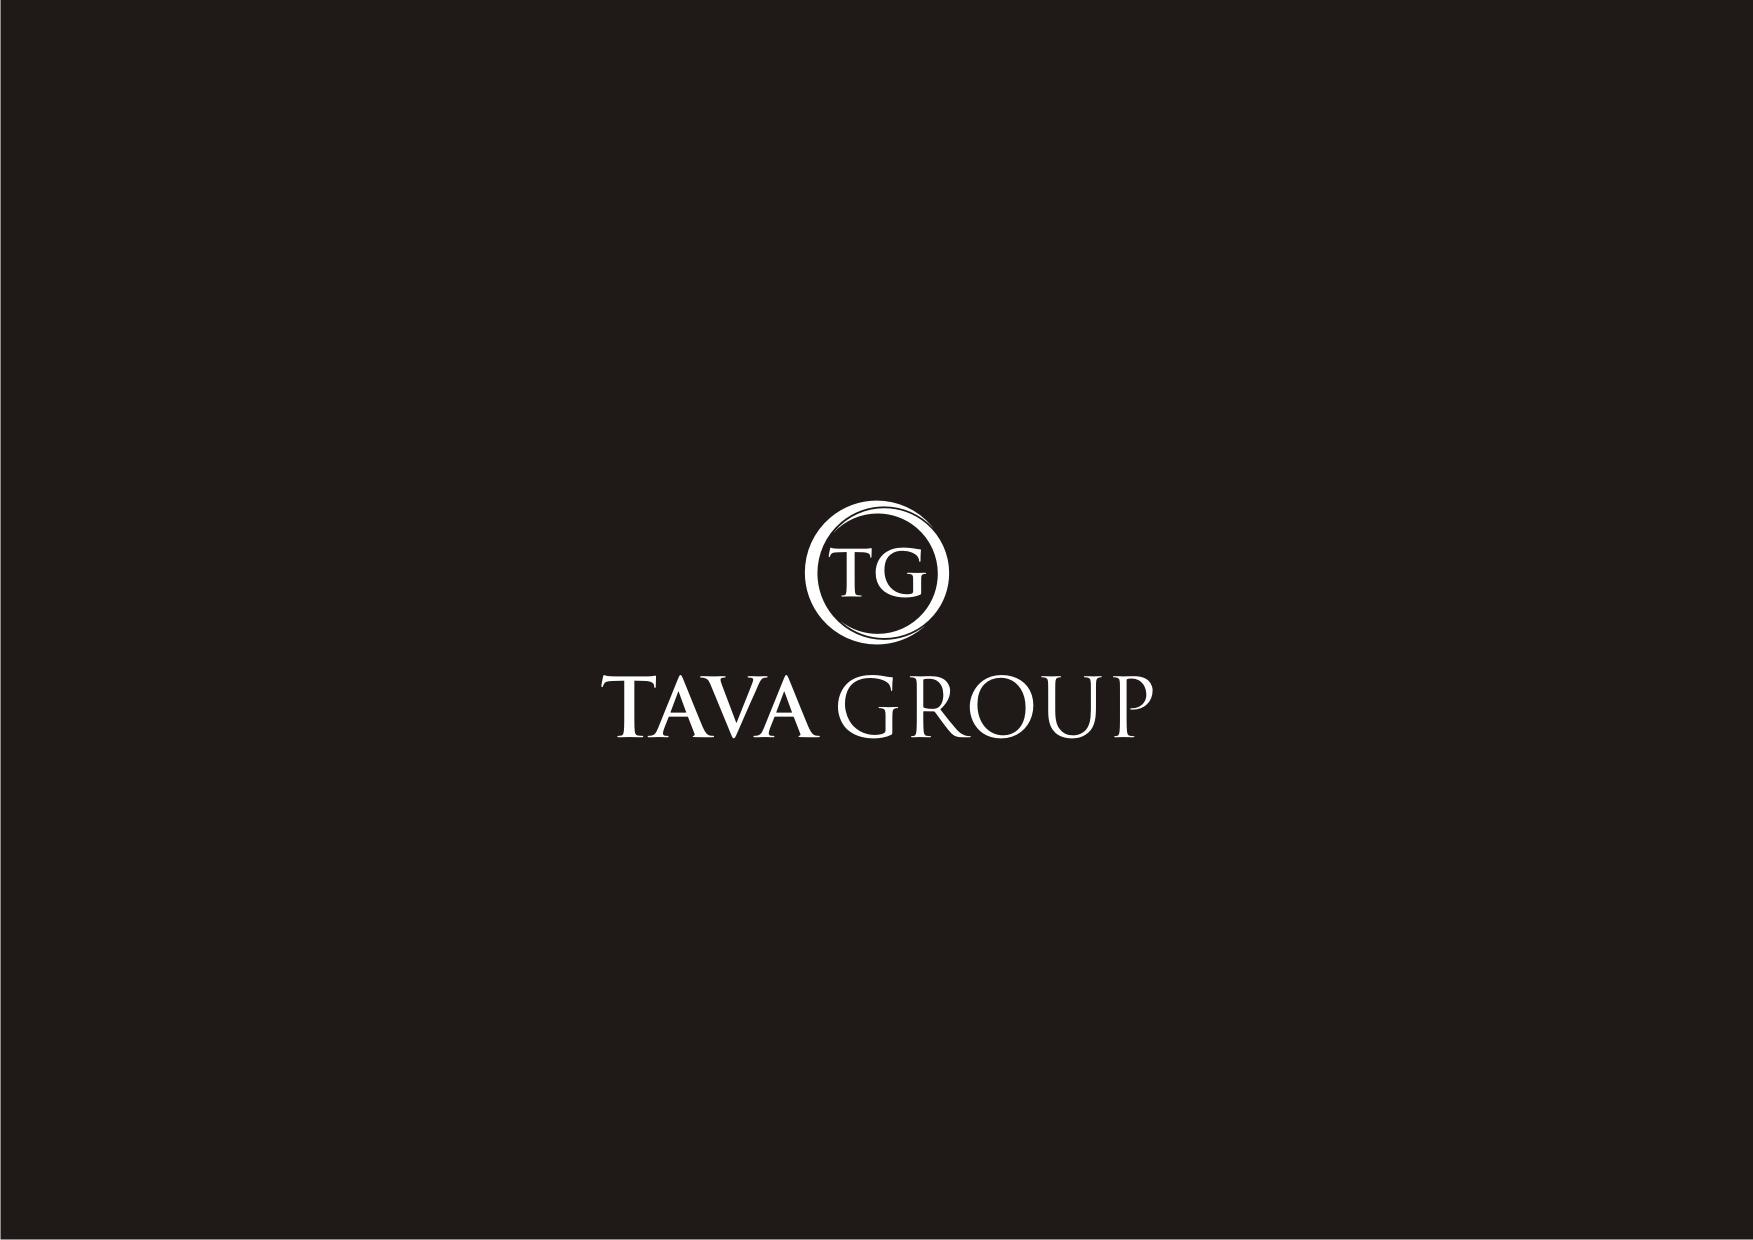 Logo Design by Sigitumarali Sigit - Entry No. 252 in the Logo Design Contest Creative Logo Design for Tava Group.